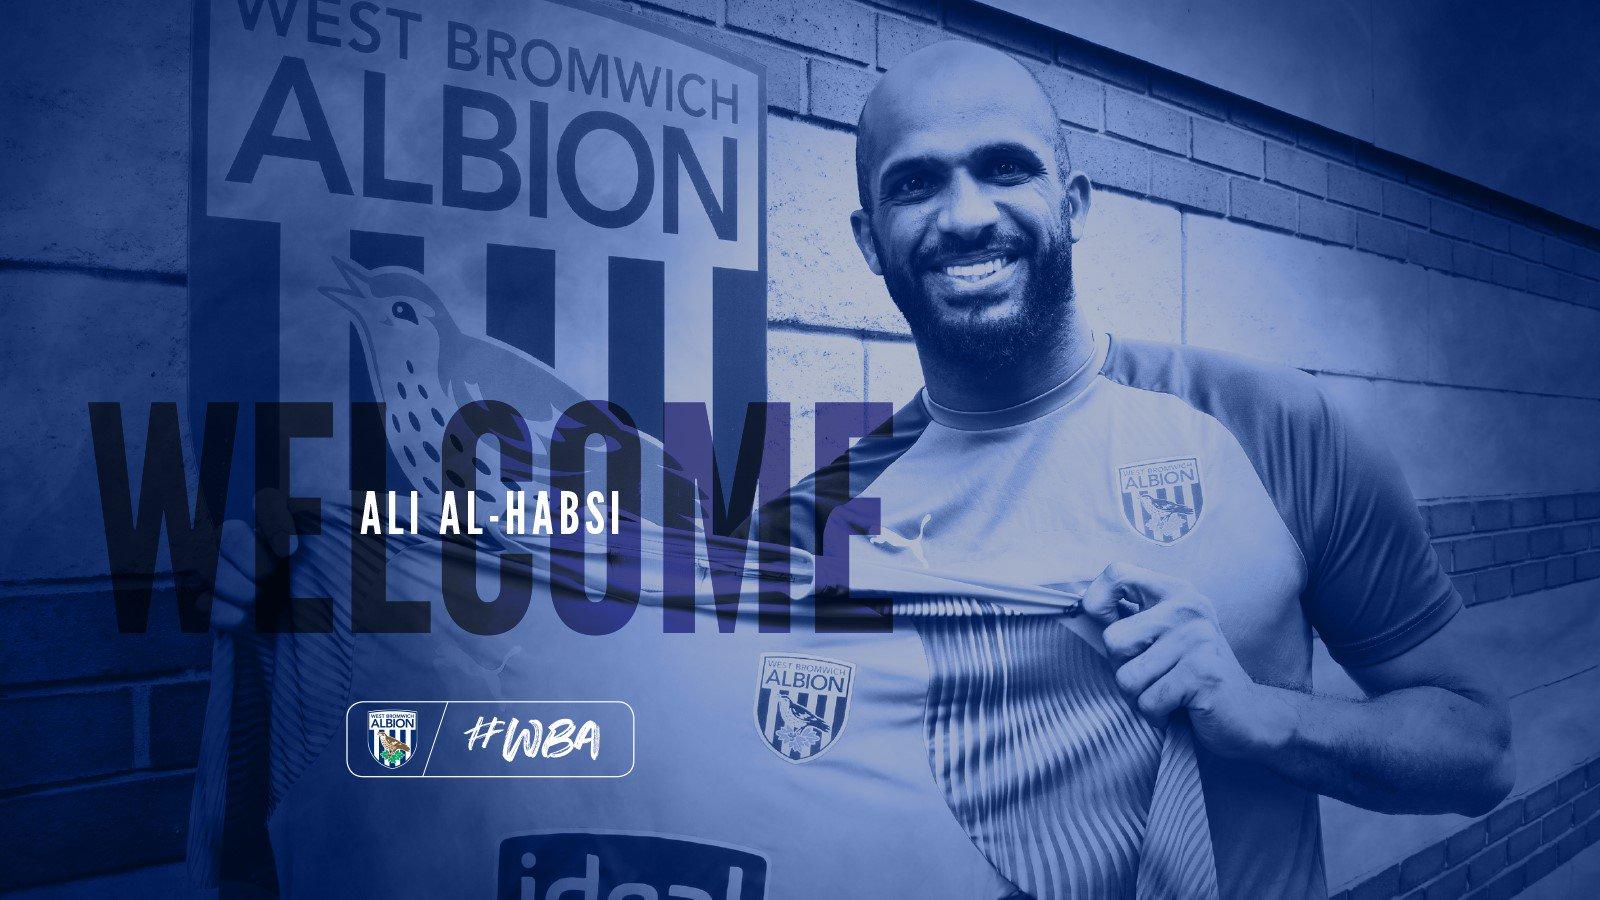 Ali Al Habsi joins English side West Brom